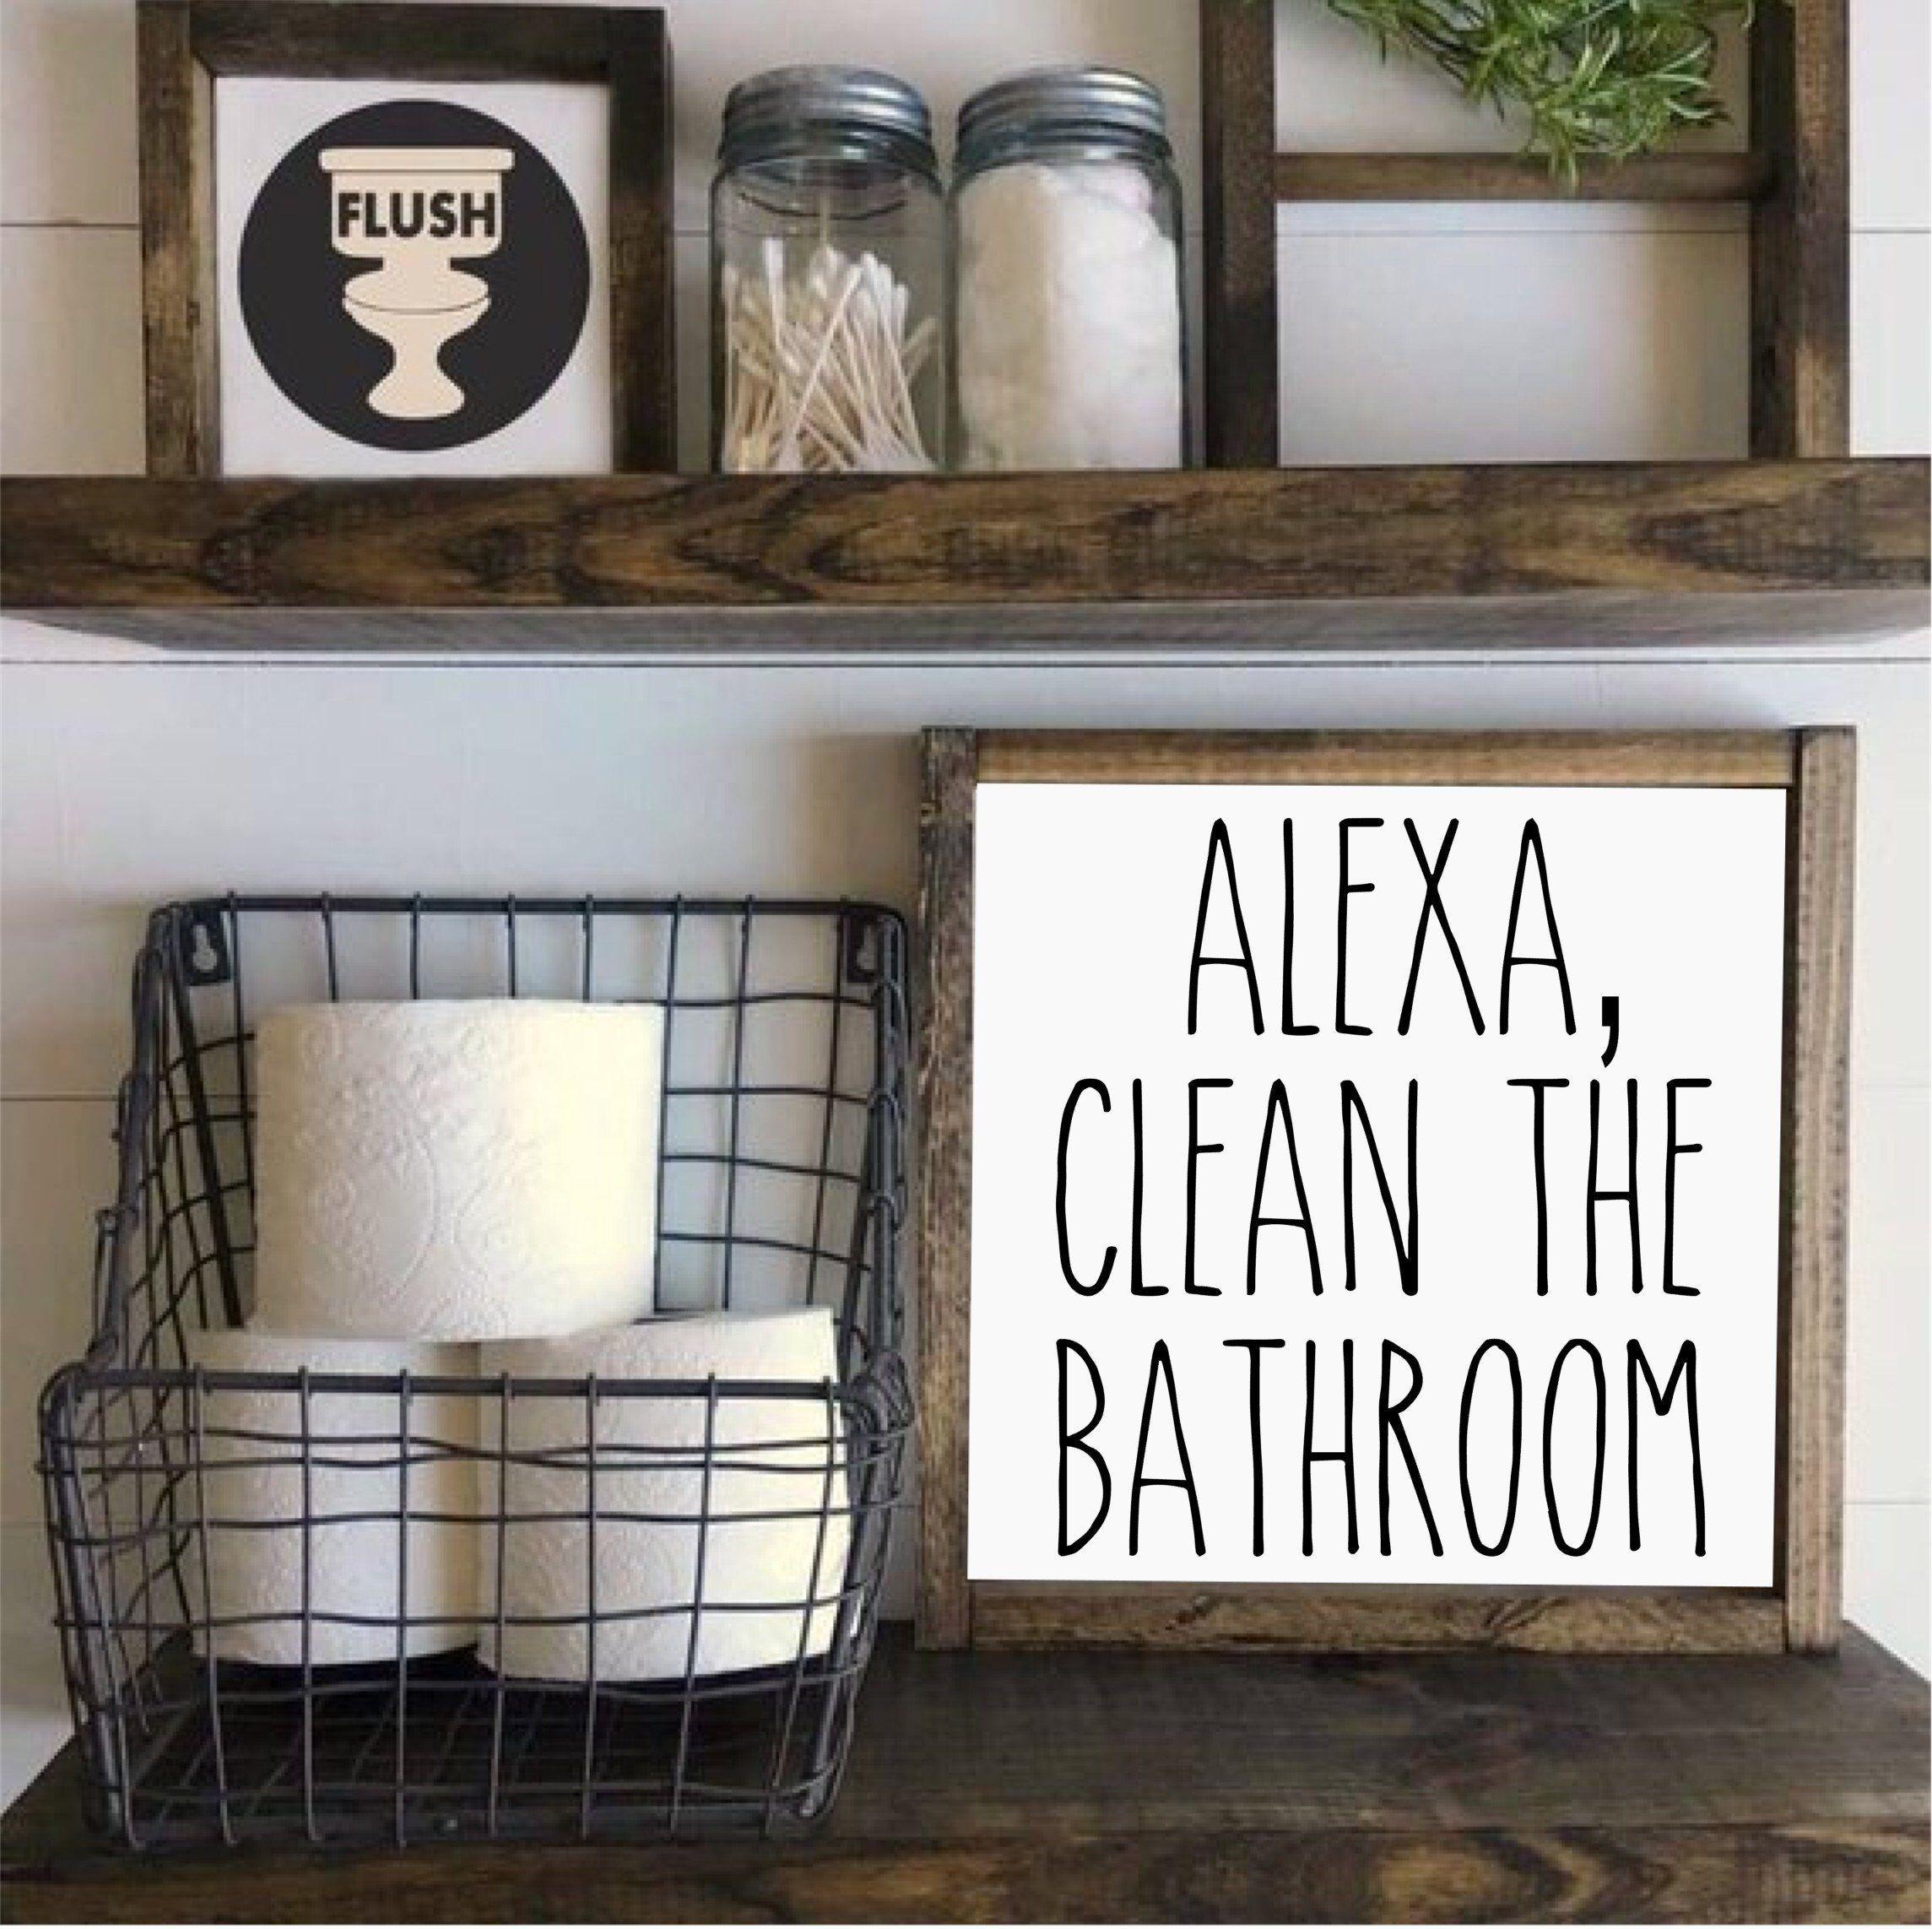 Alexa Clean The Bathroom Farmhouse Style Wood Sign Framed Etsy Restroom Decor Bathroom Wall Art Funny Bathroom Signs